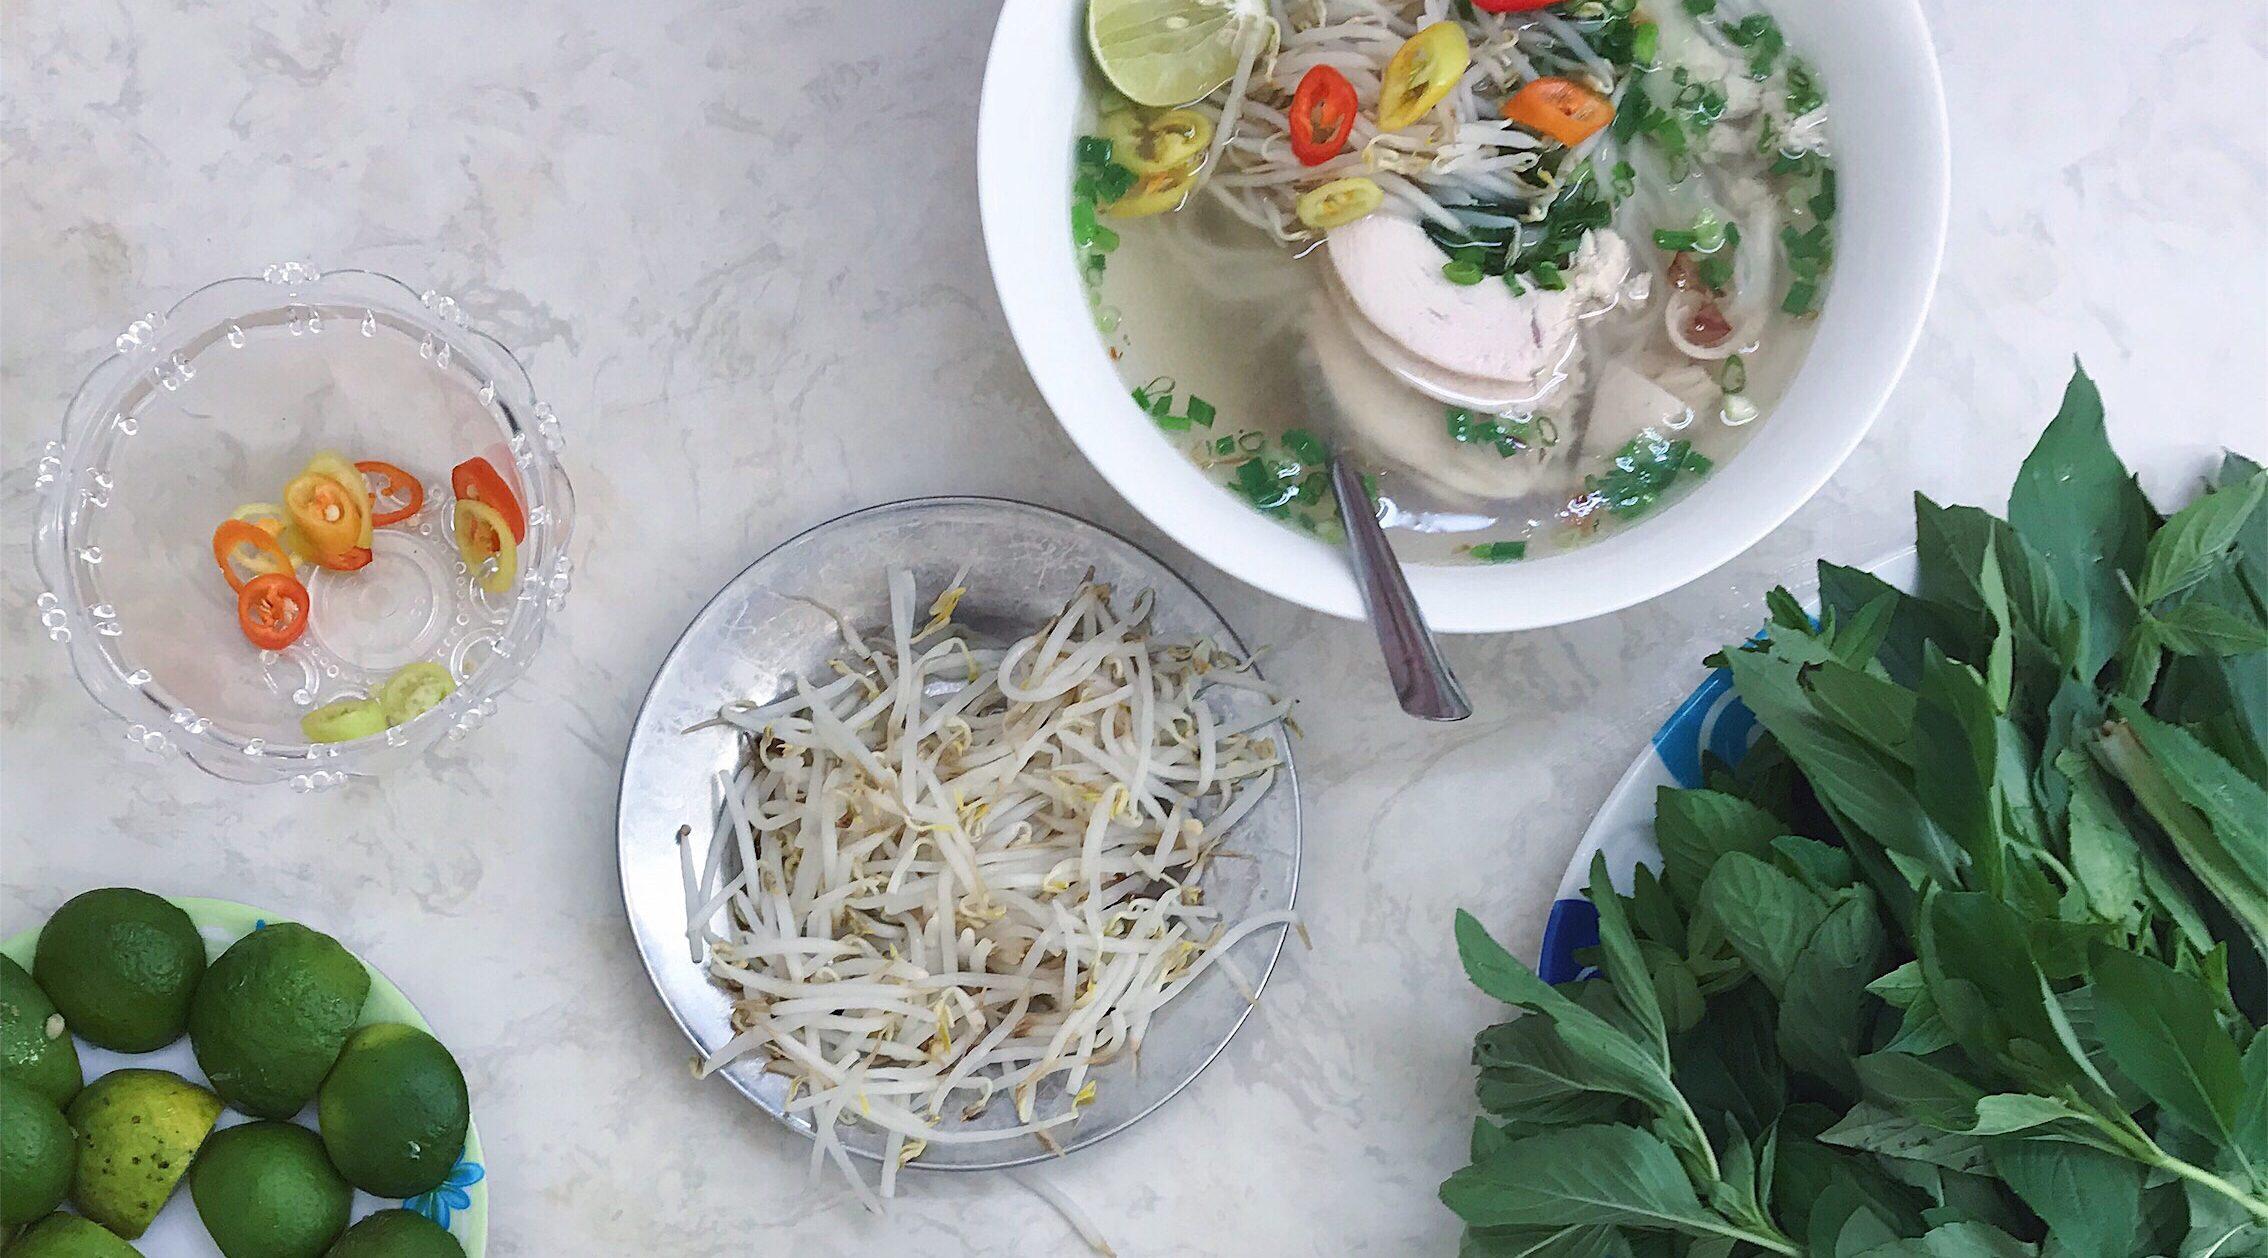 Travel & eat here: Ho Chi Minh City, Vietnam.